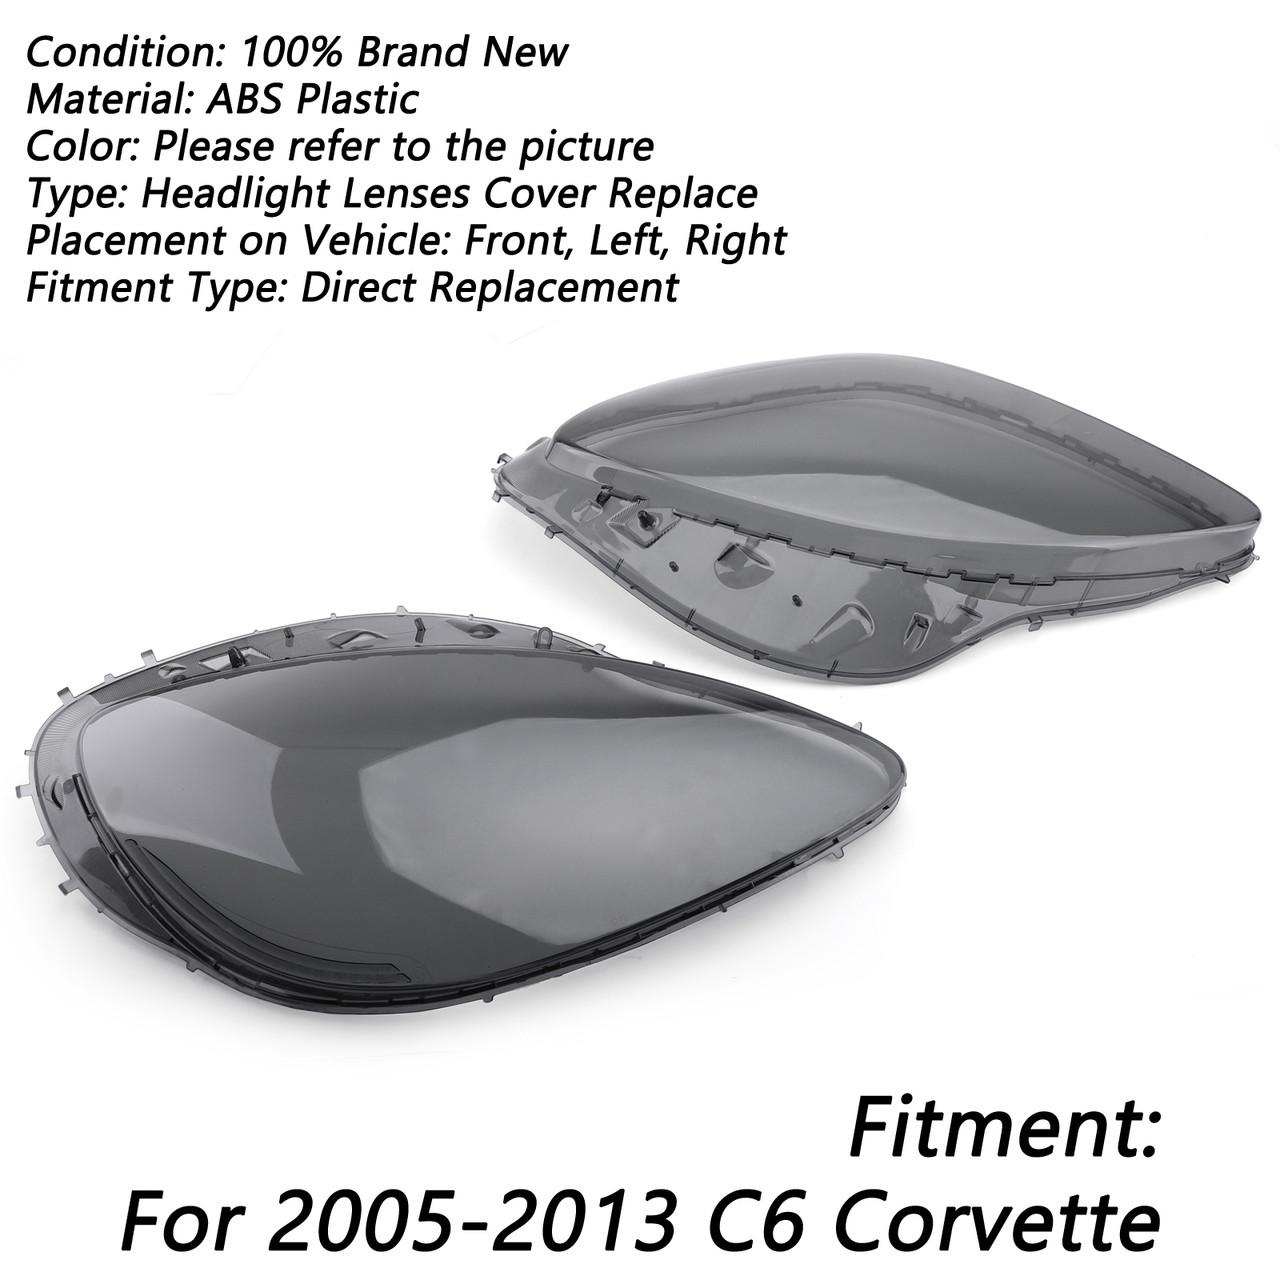 Pair Left Right Head Light Lenses Replacement Covers Smoke For C6 Corvette 05-13 Gray